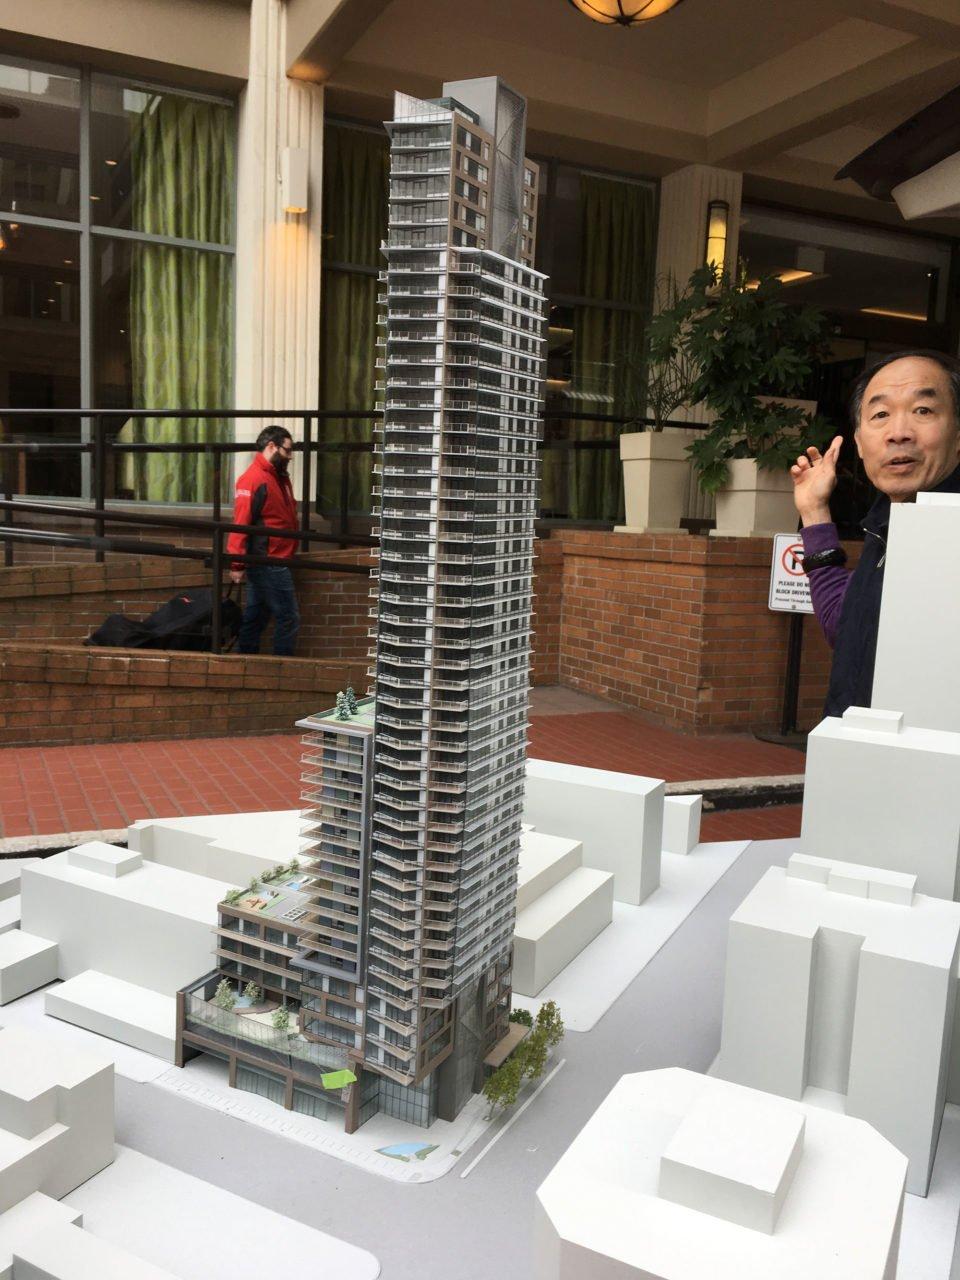 Davie and Burrard tower model